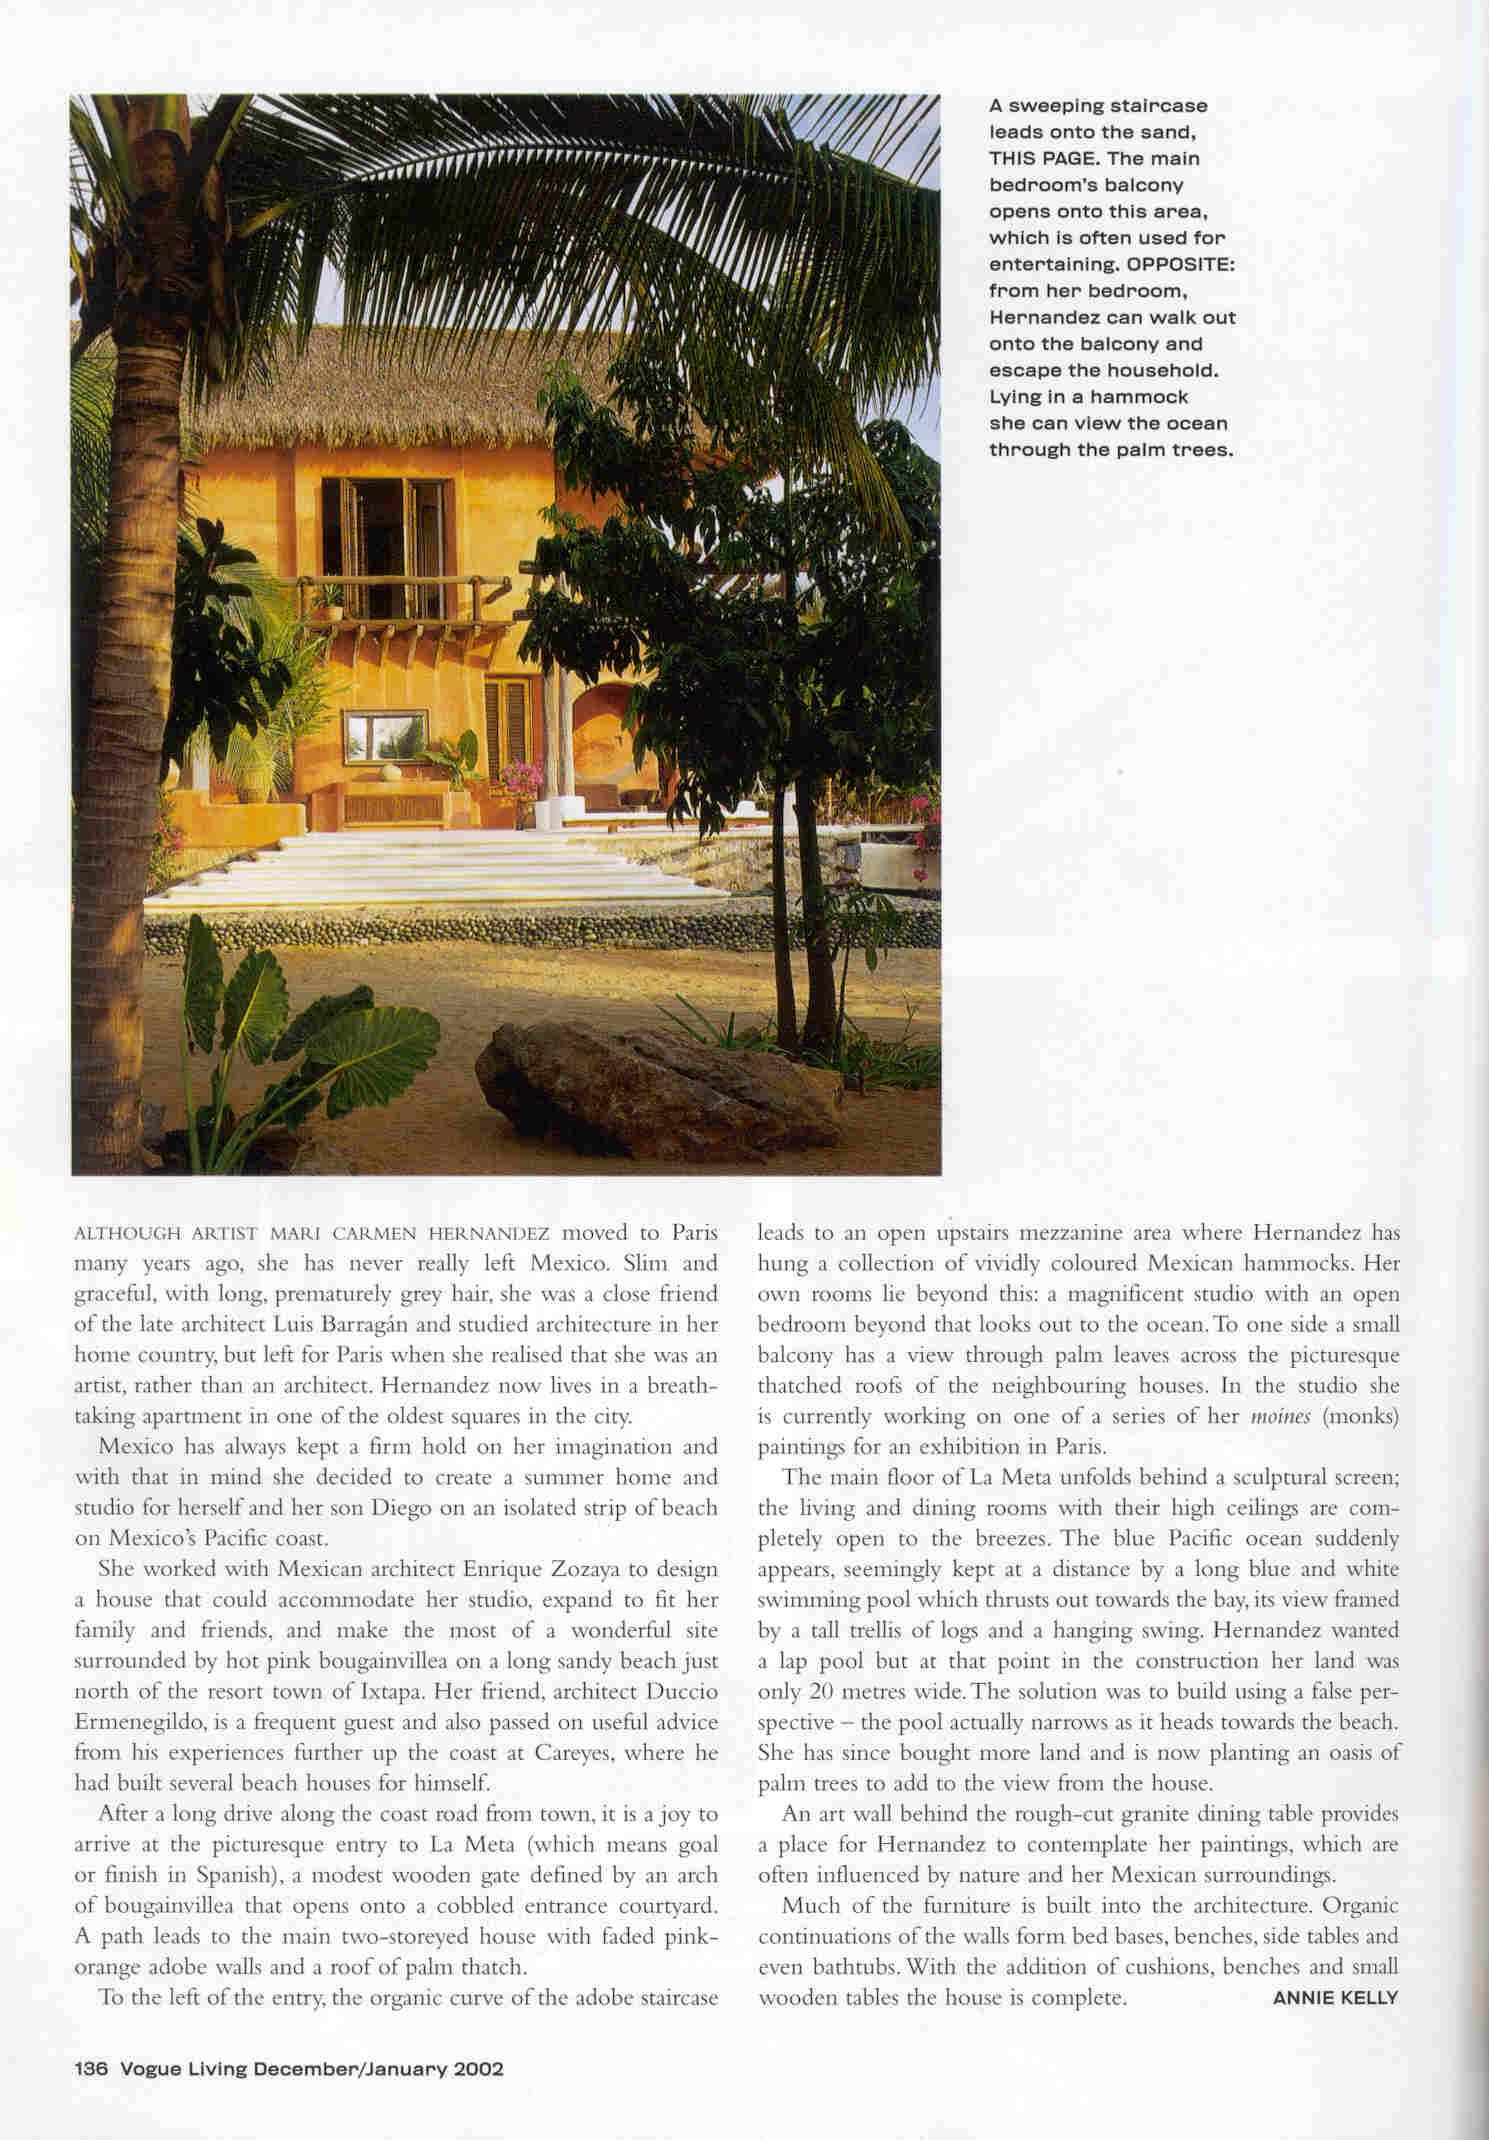 page136.jpg